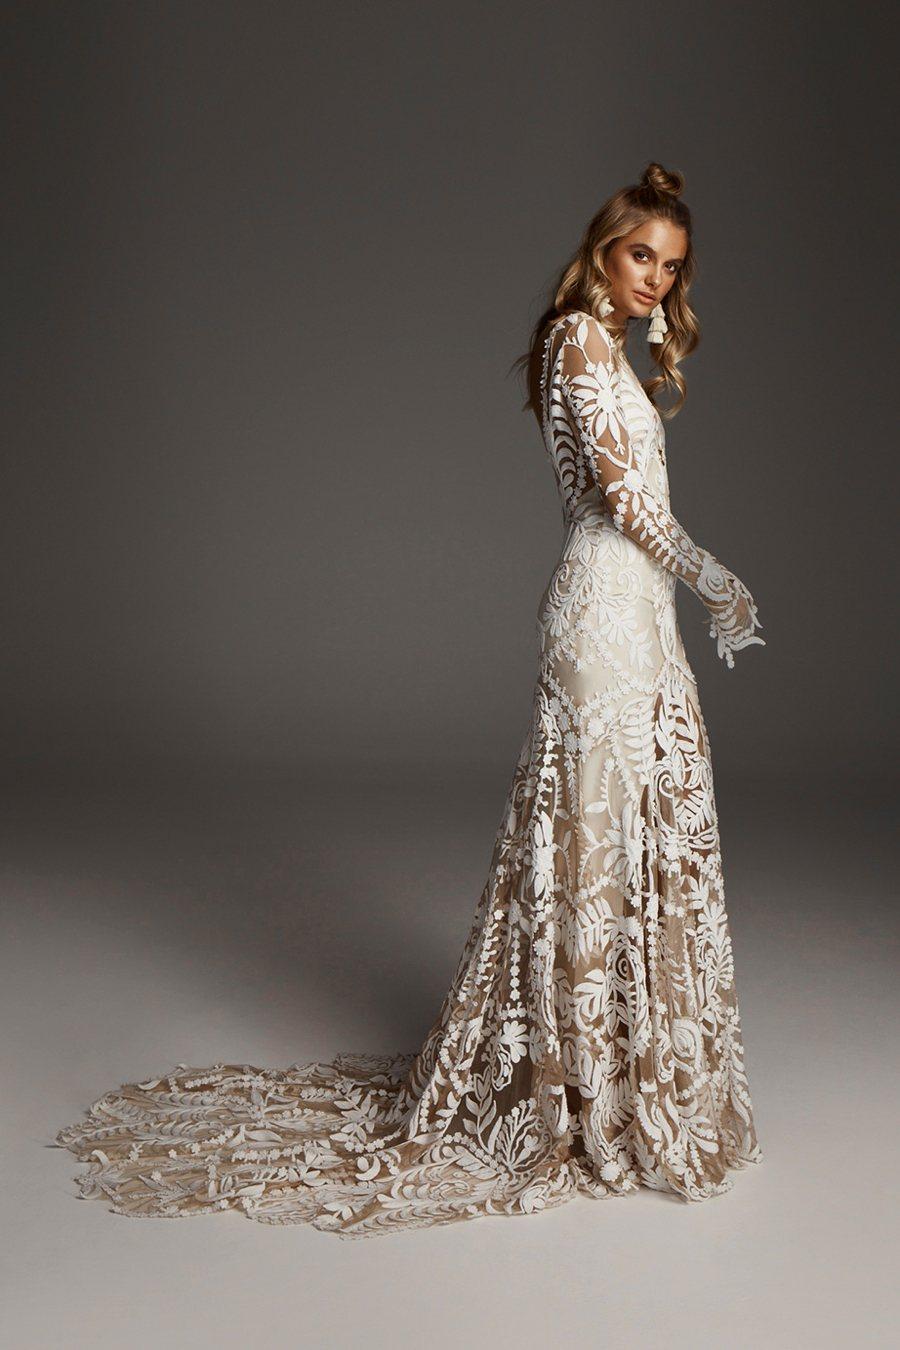 64d5db98236 The Avril wedding gown by Rue De Seine. Photo via Rue De Seine website